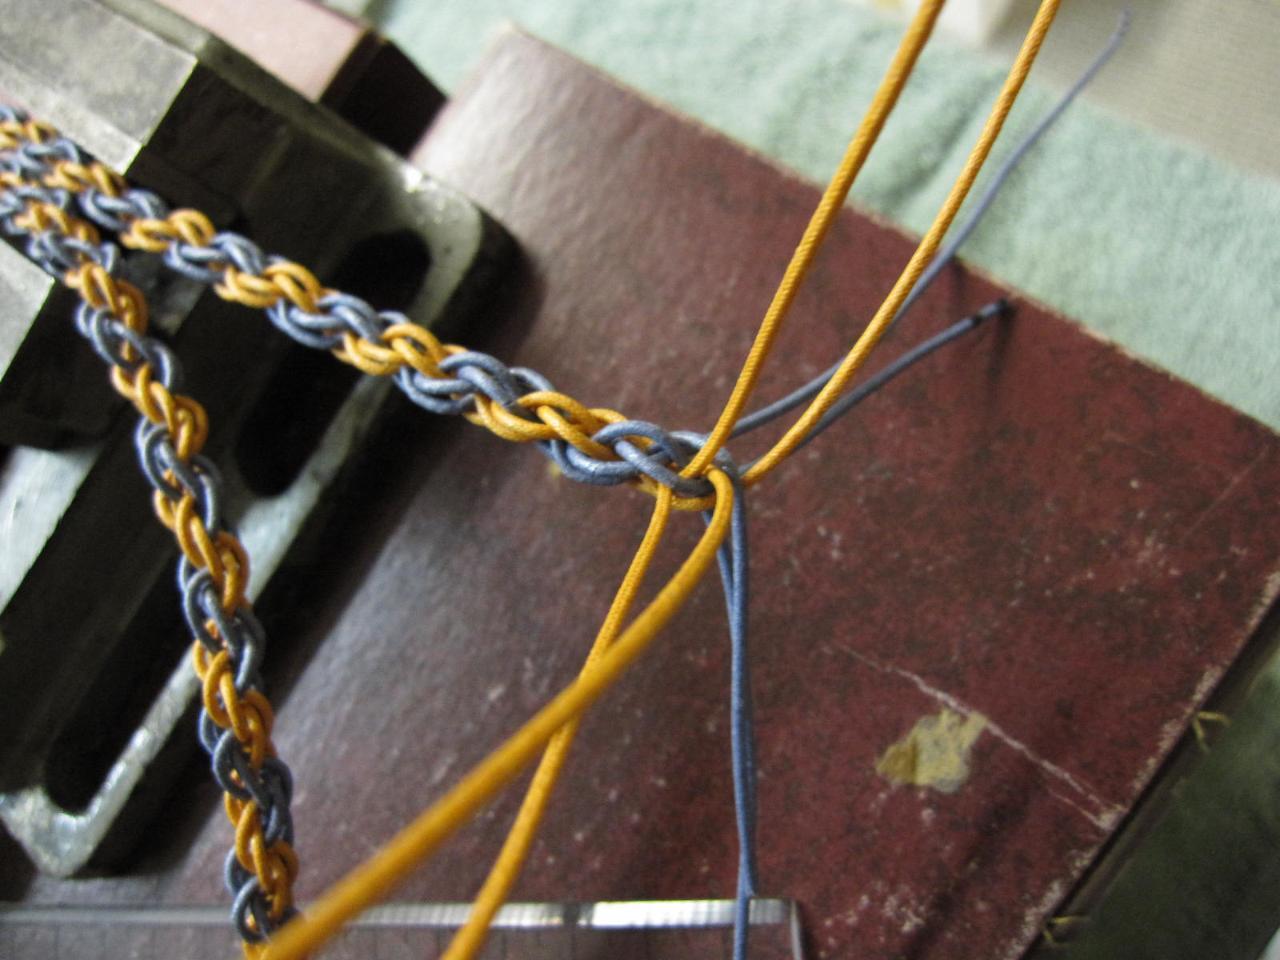 8 strand braid<br /> solid core<br /> silver plated copper<br /> cryo